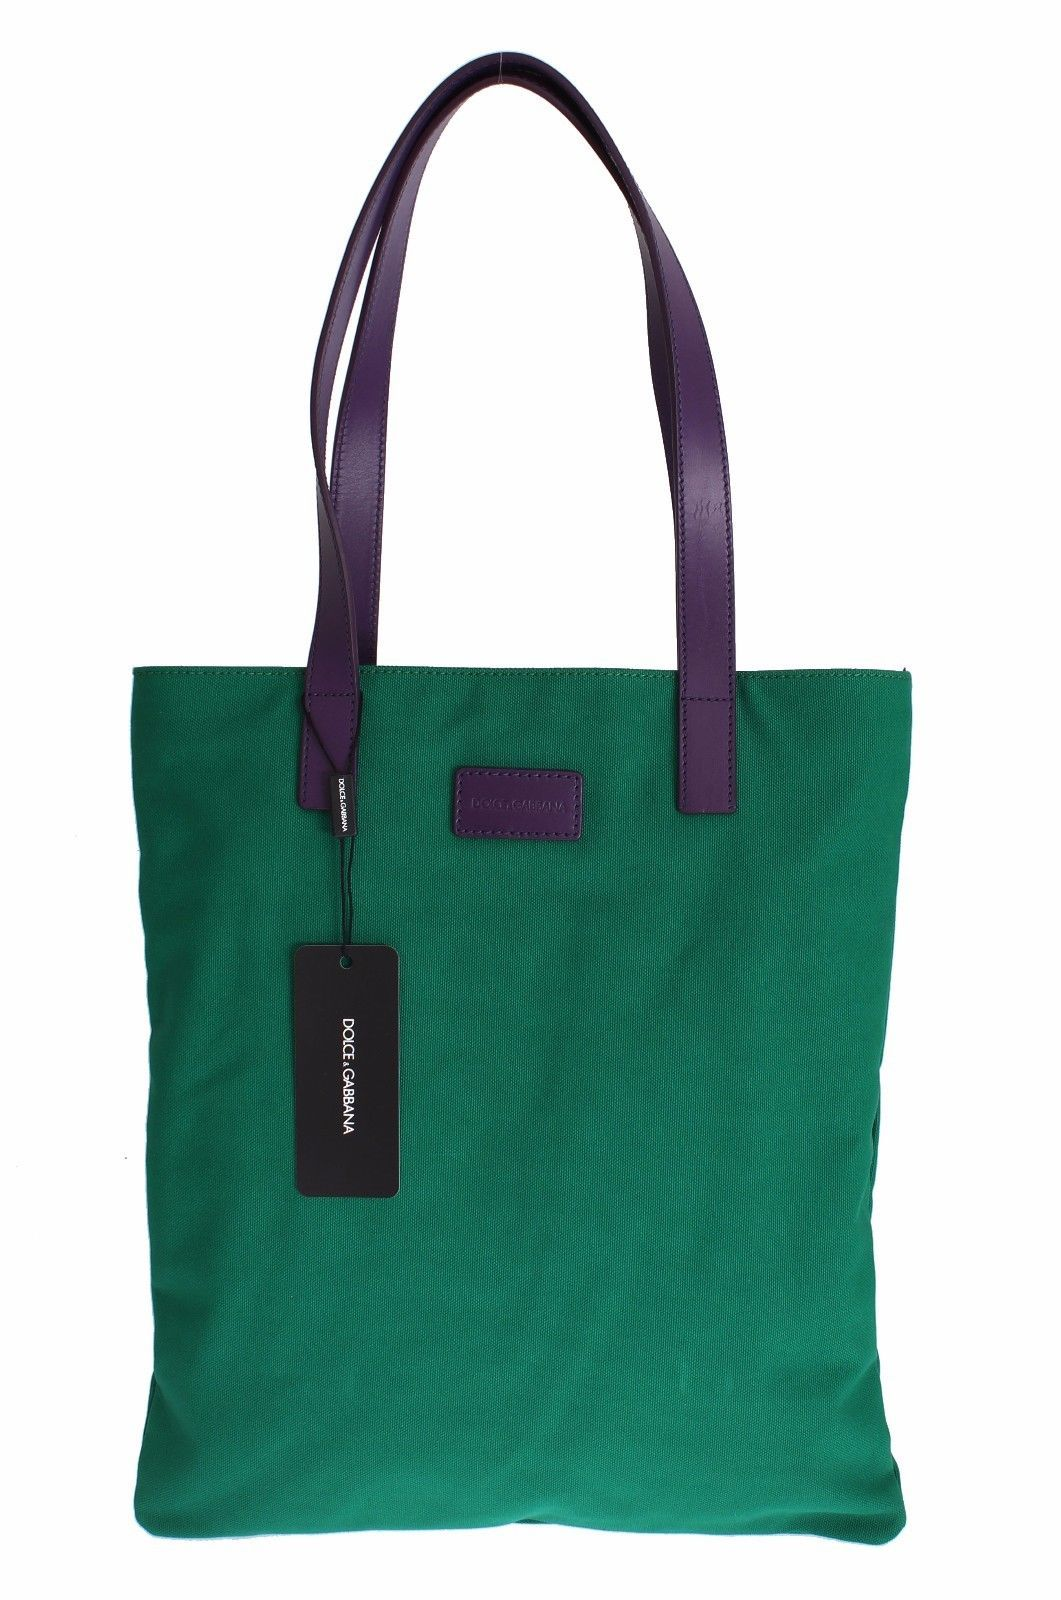 ed5fdfe51a71 Dolce   Gabbana Green Denim Leather Hand Shoulder Travel Bag in 2018 ...